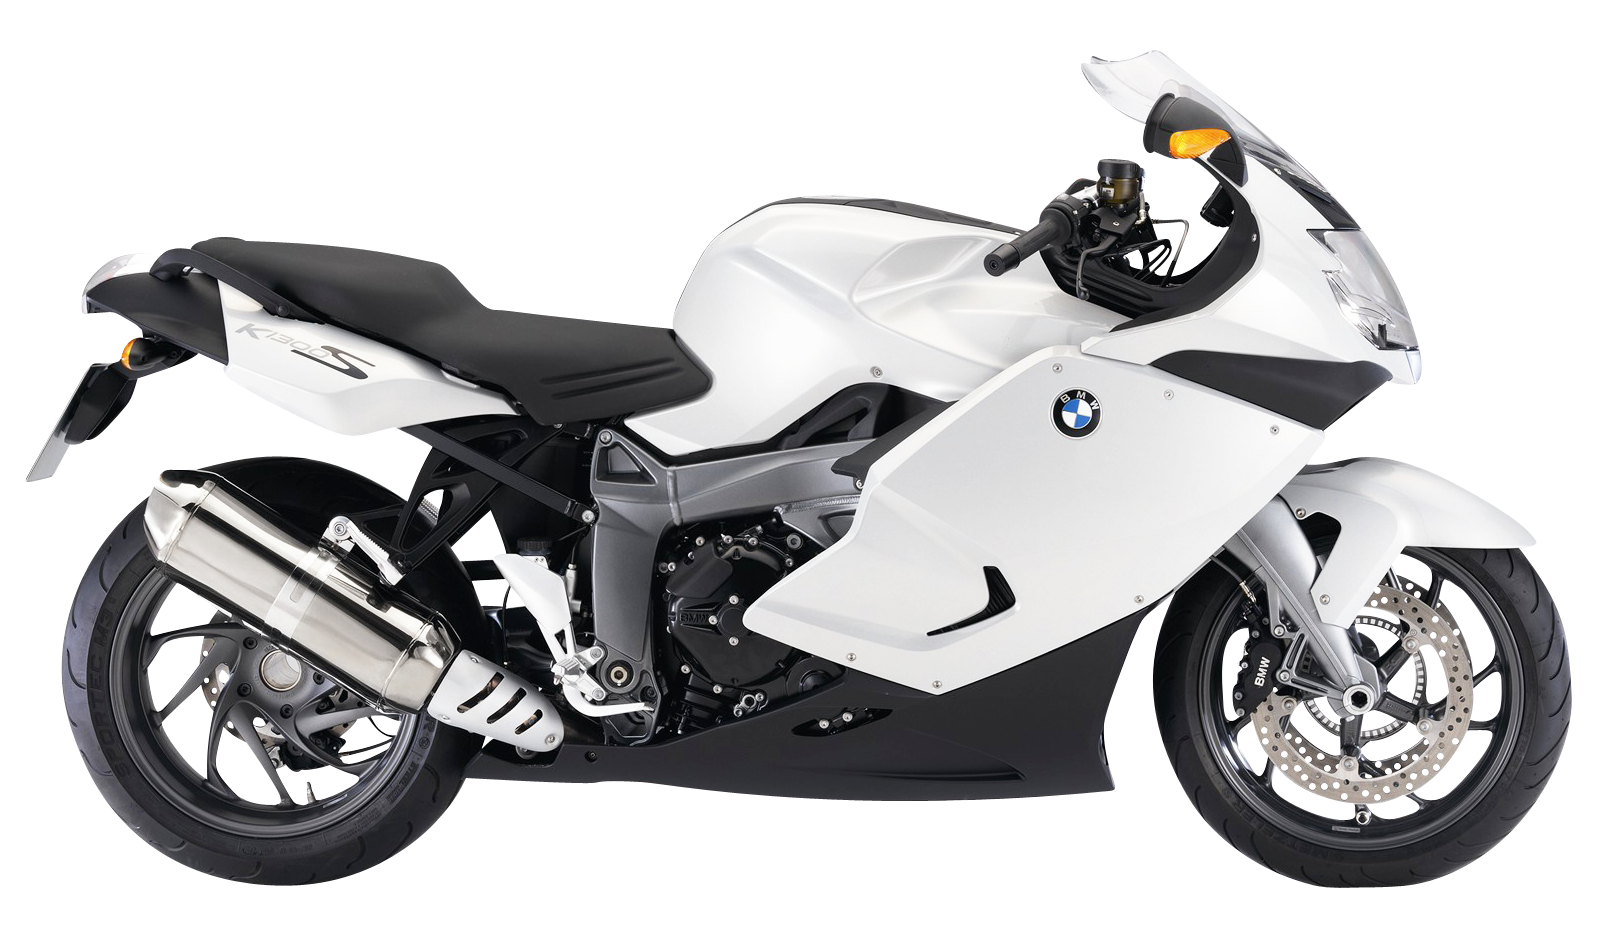 Bmw K1300s White Png Image Bmw Street Bike Motorcycle Bmw